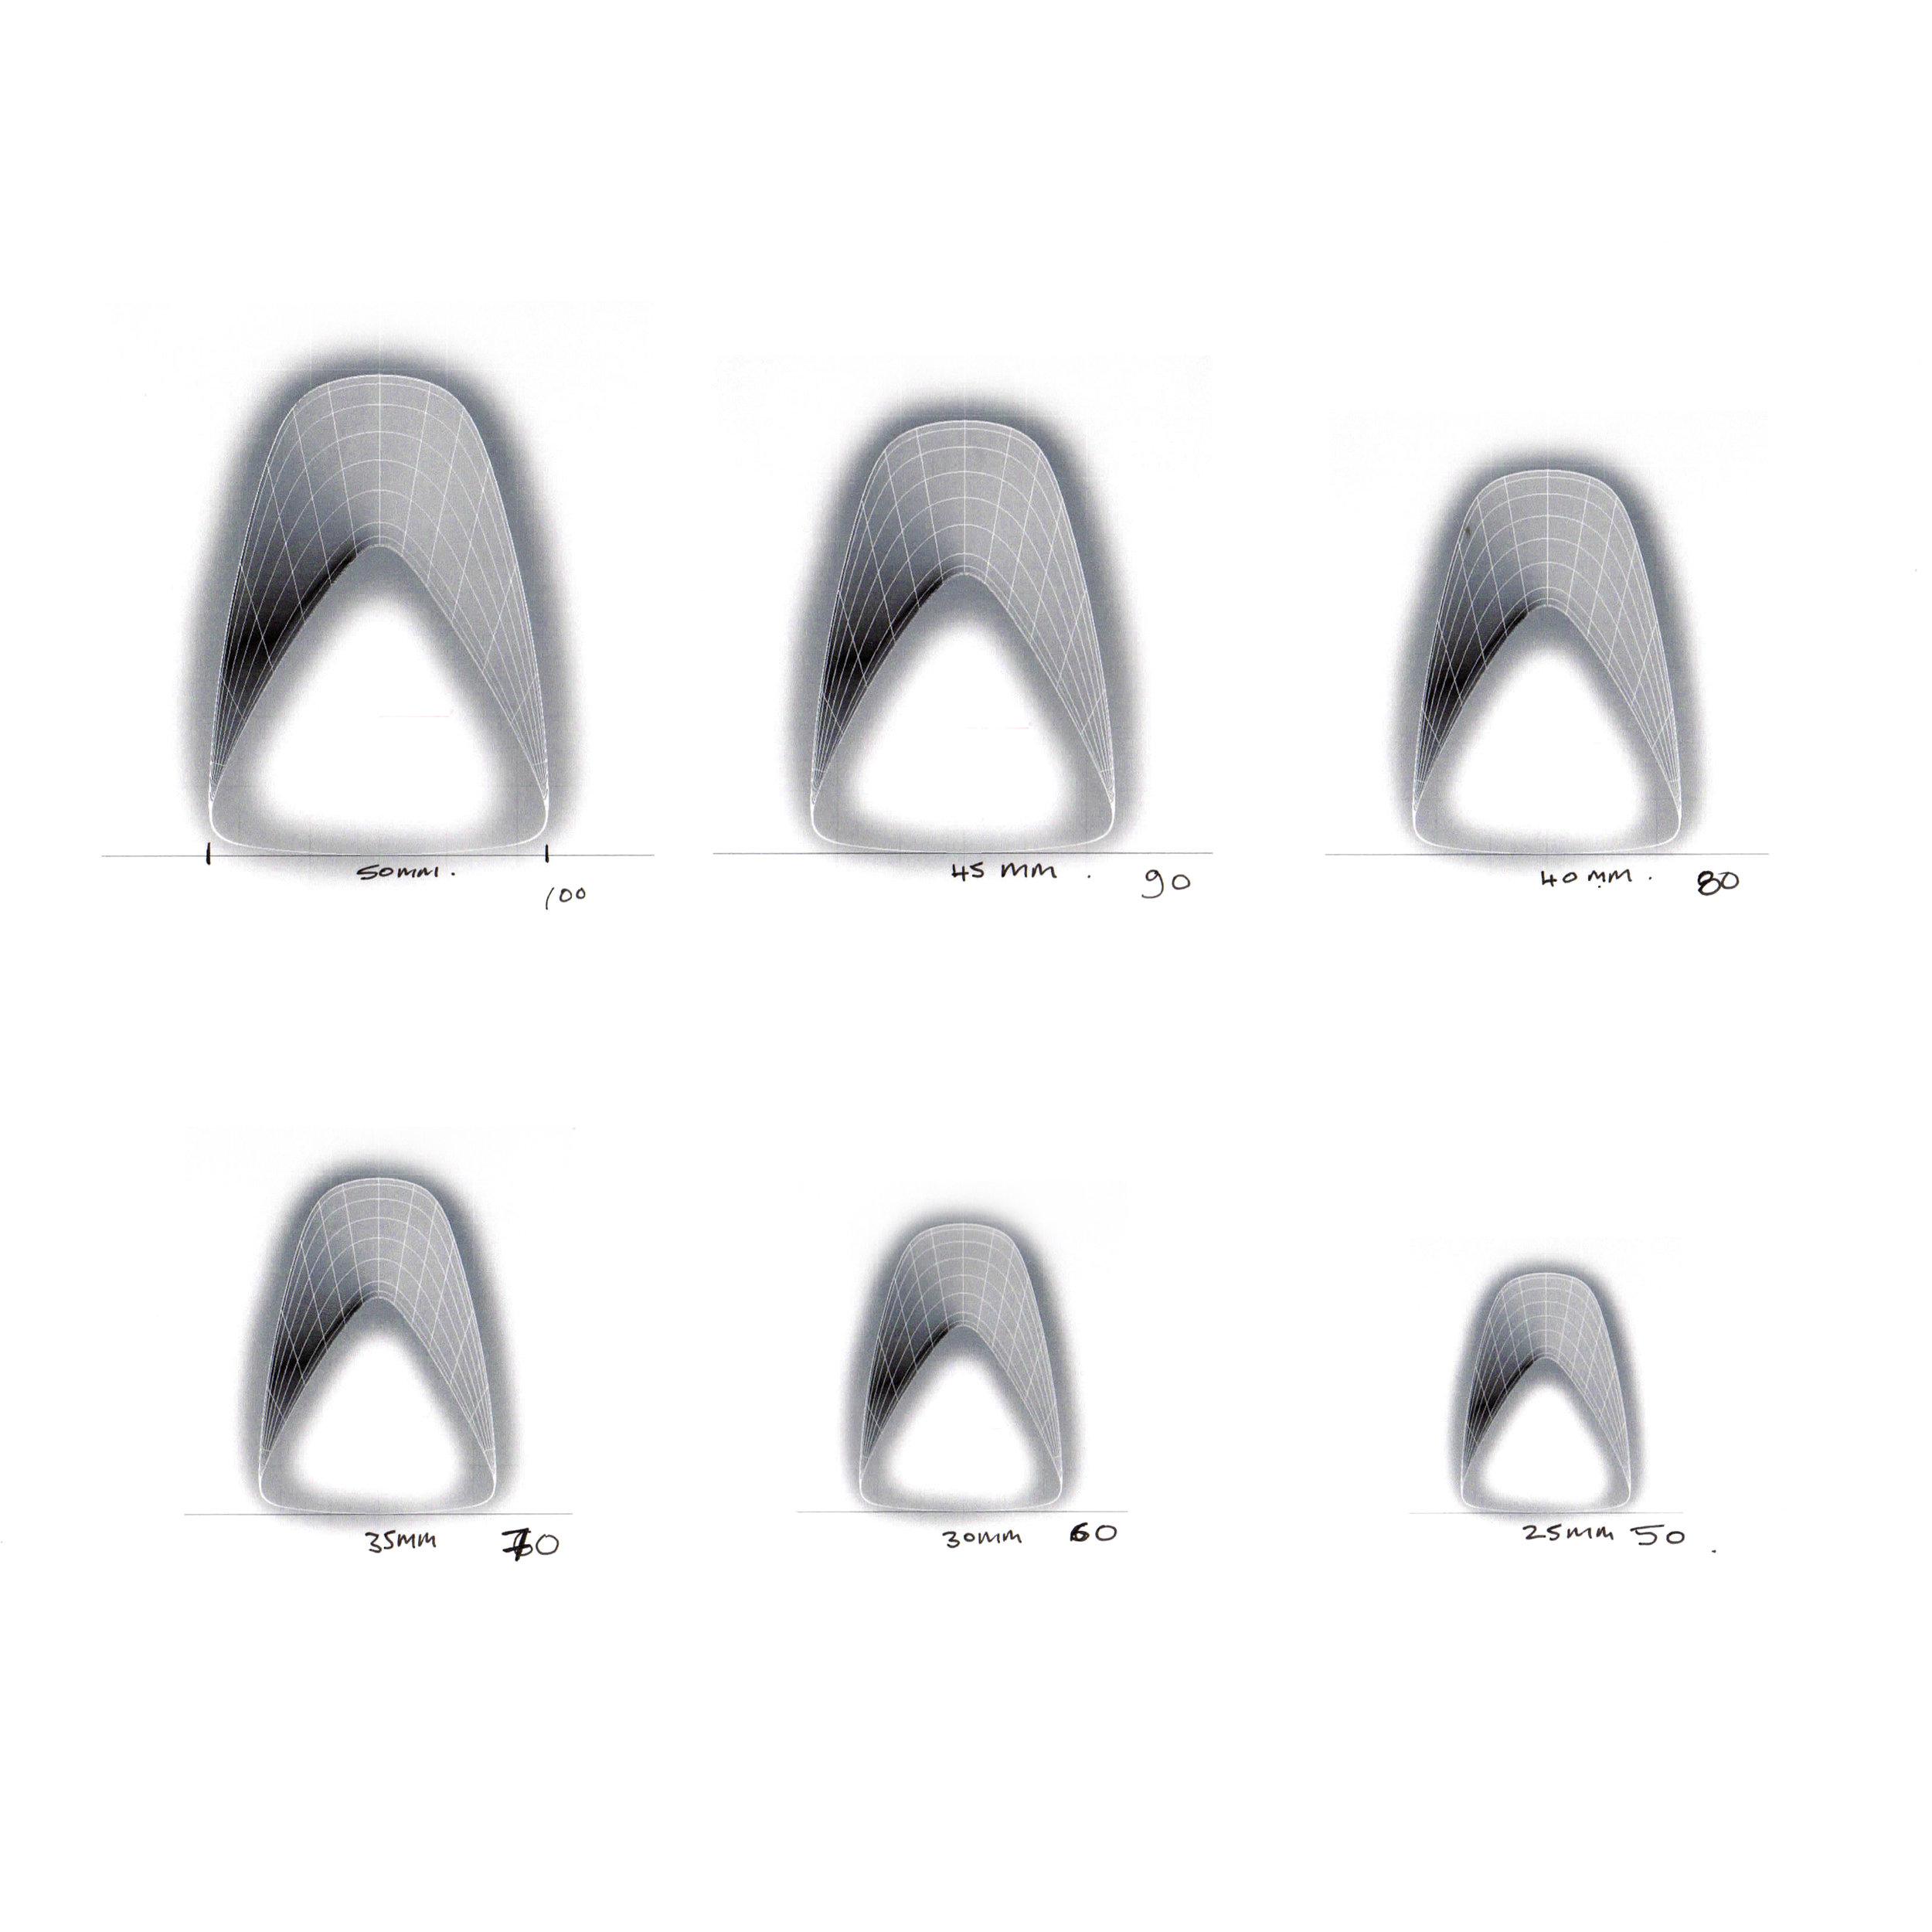 Nest Tables - Progressive cross-section of leg profile